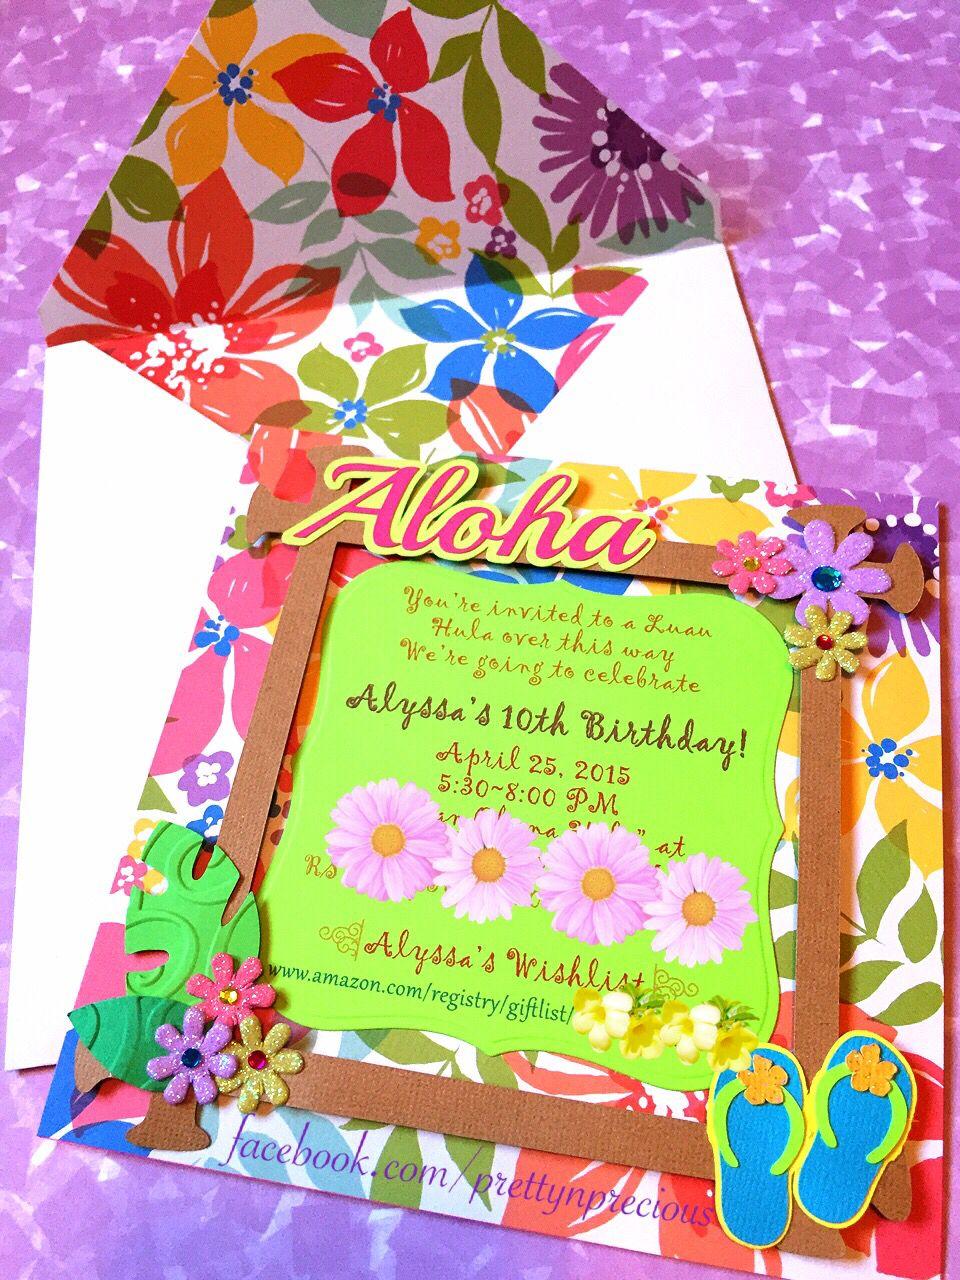 Luau Party handmade invitation